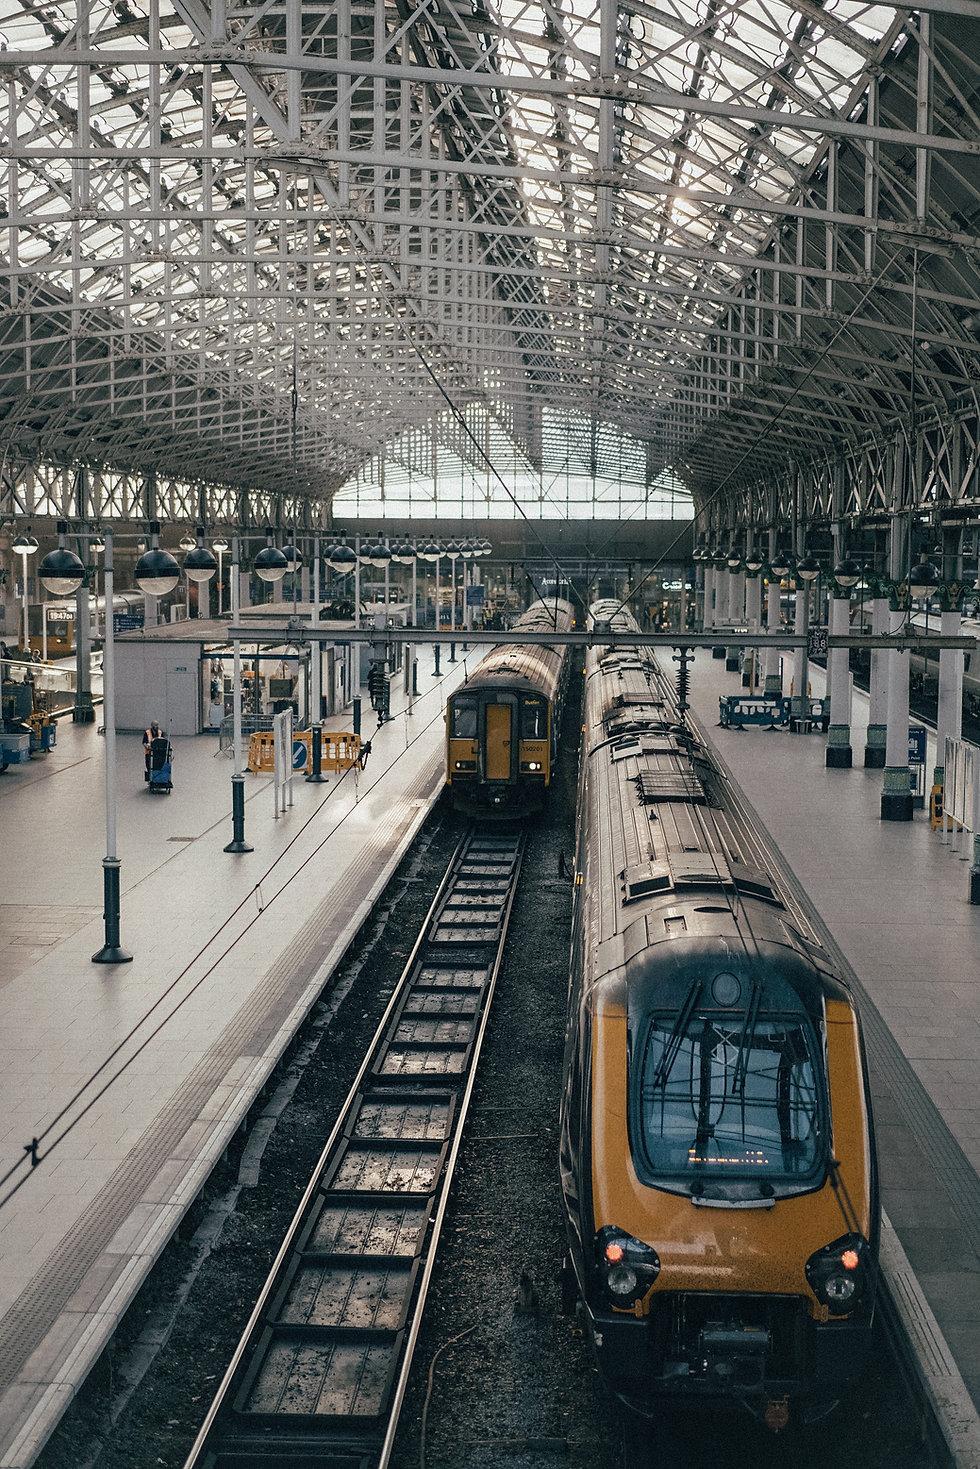 rail trains in train station